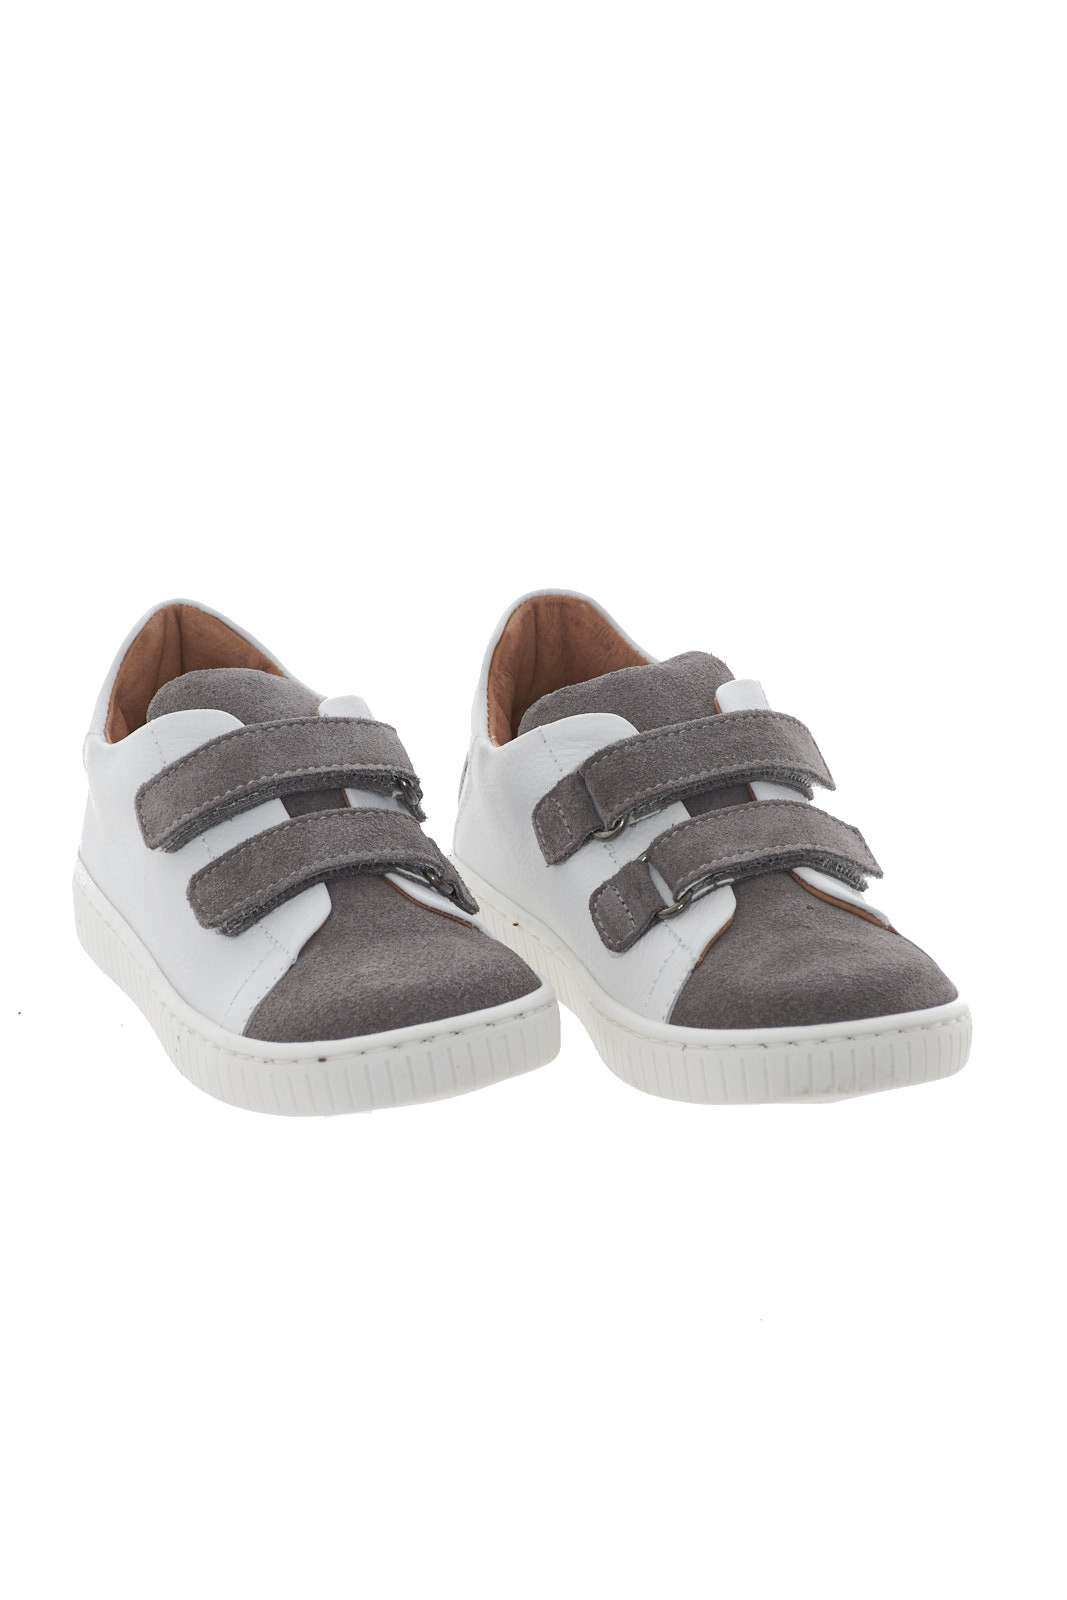 https://www.parmax.com/media/catalog/product/A/I/AI-outlet_parmax-sneaker-bambino-Walkey-Piccoli-Passi-Y1B440060-B.jpg